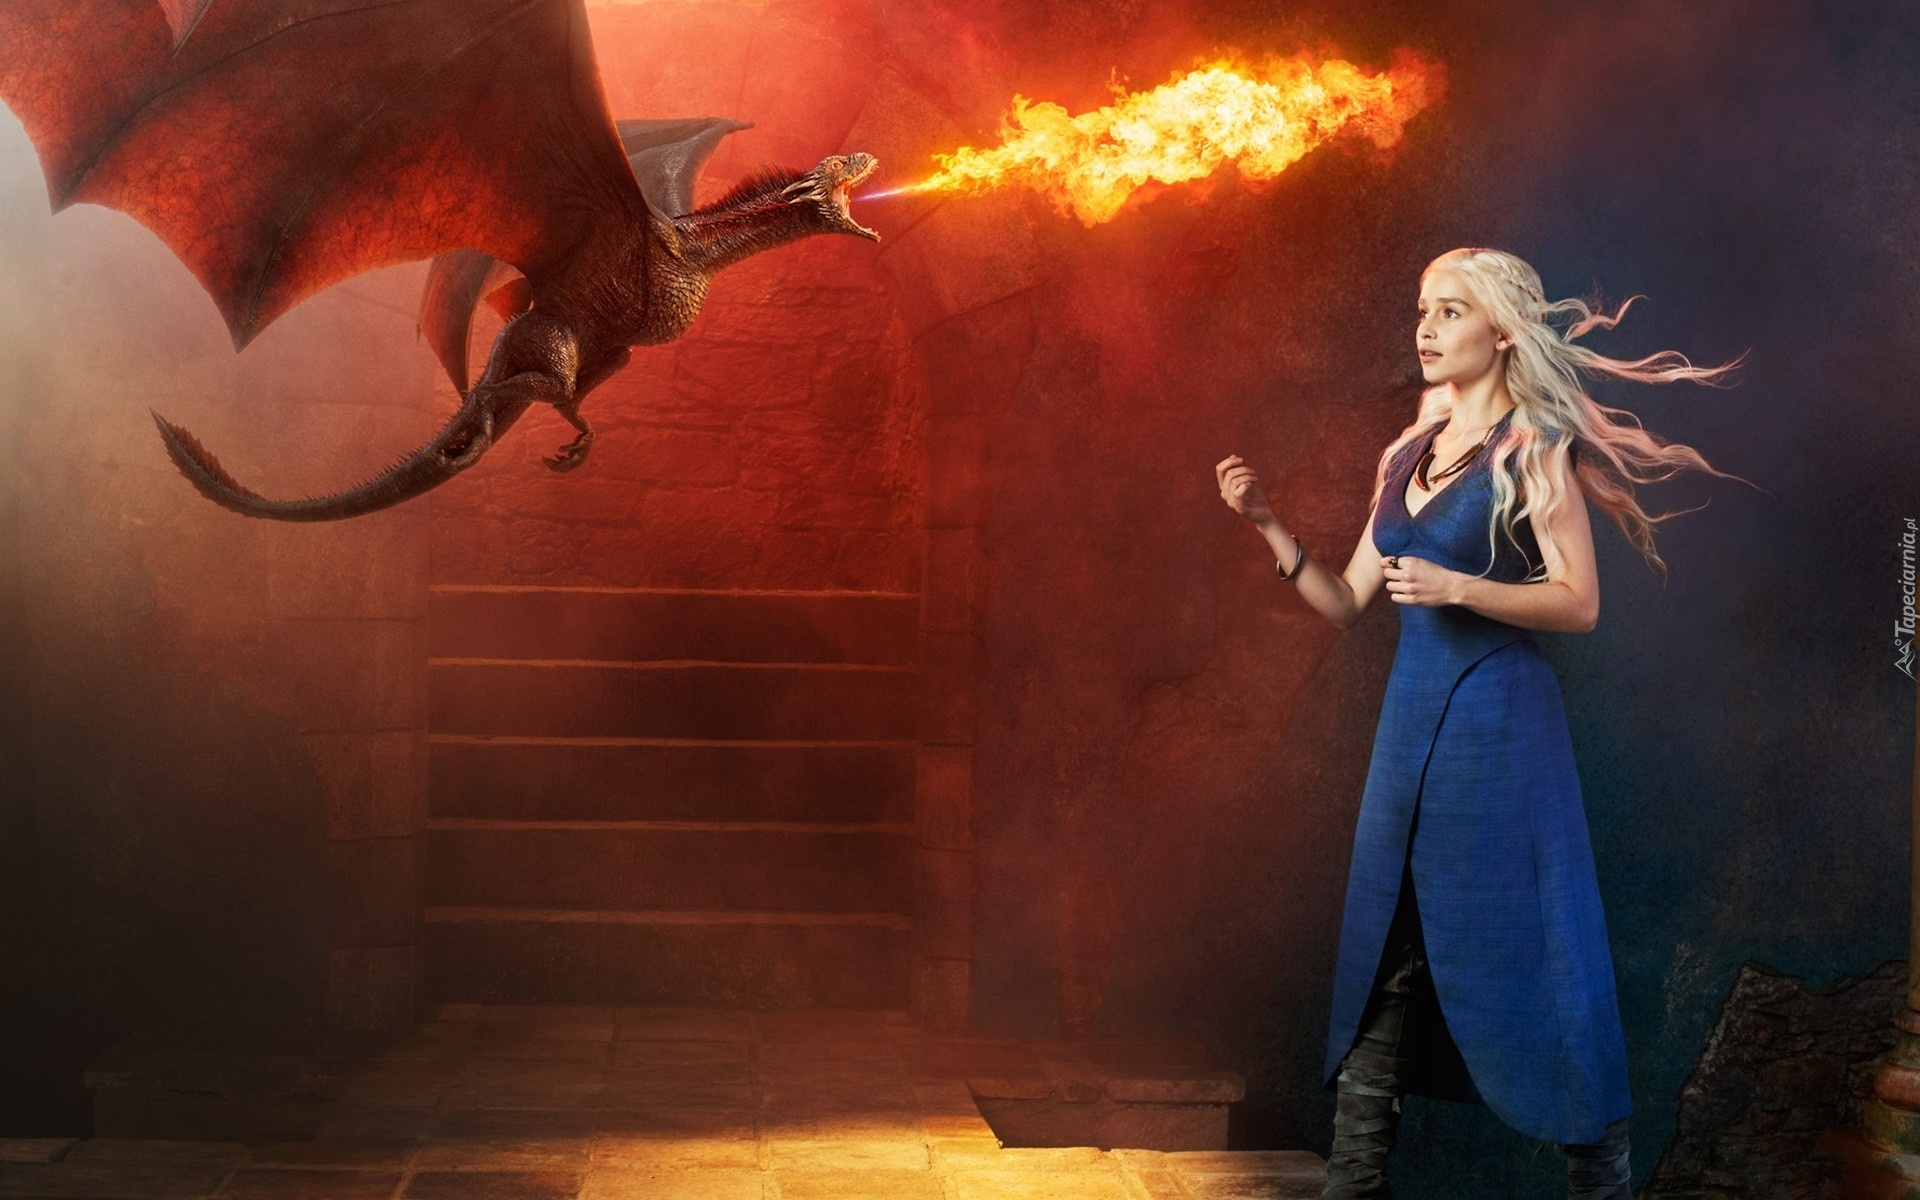 gra o tron, game of thrones, emilia clarke - daenerys targaryen, smok